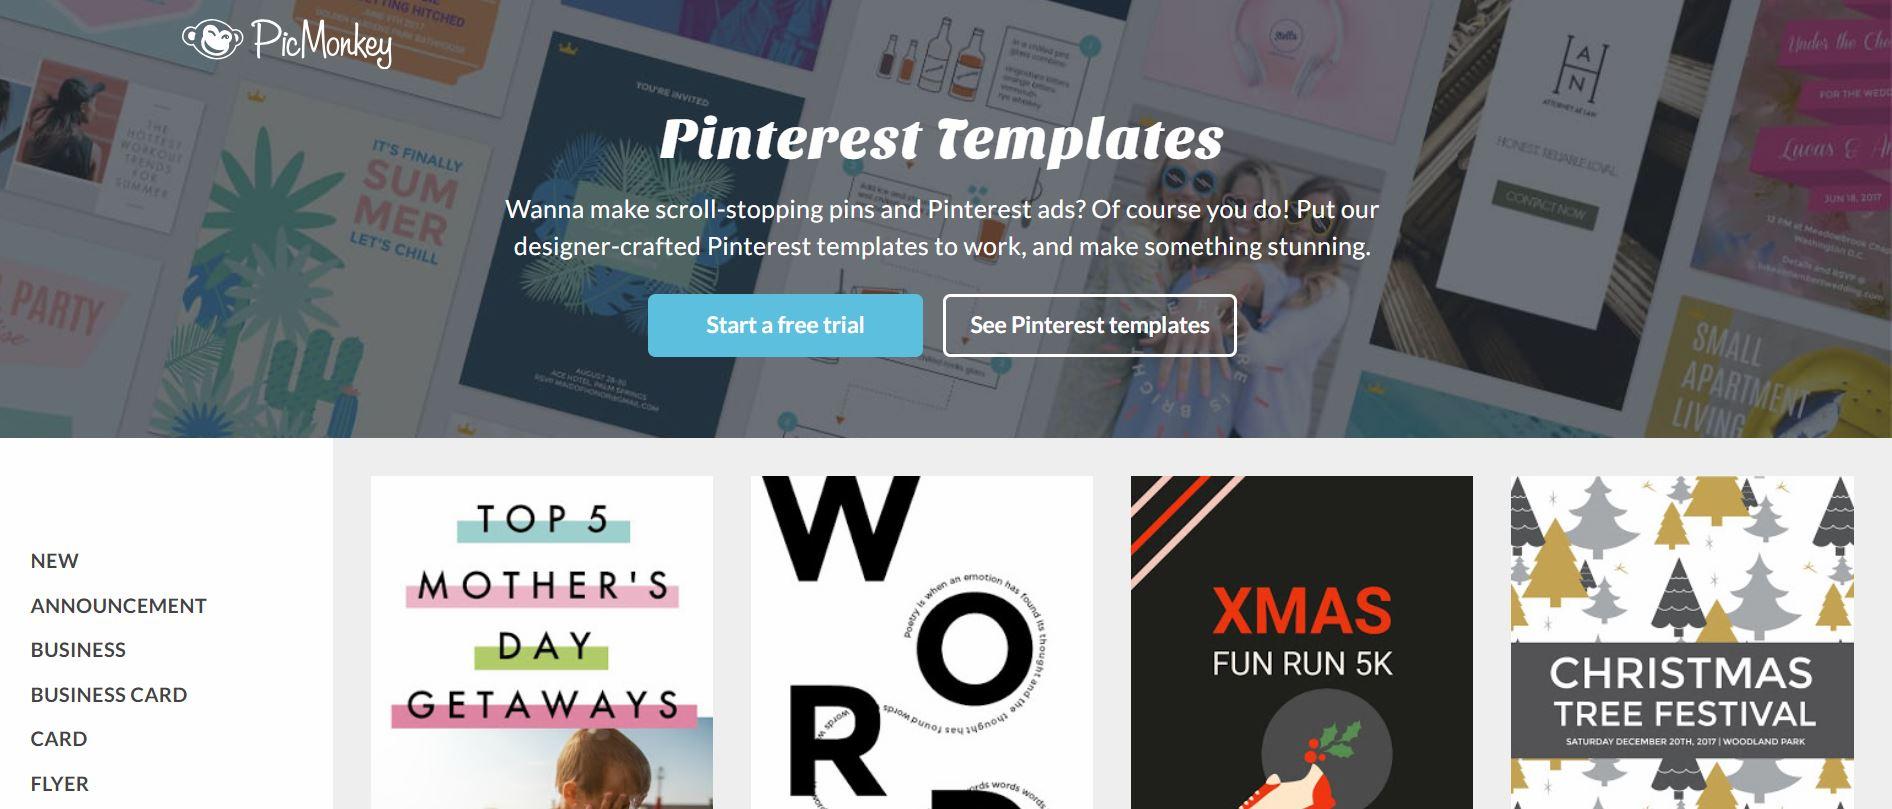 picmonkey pin design templates